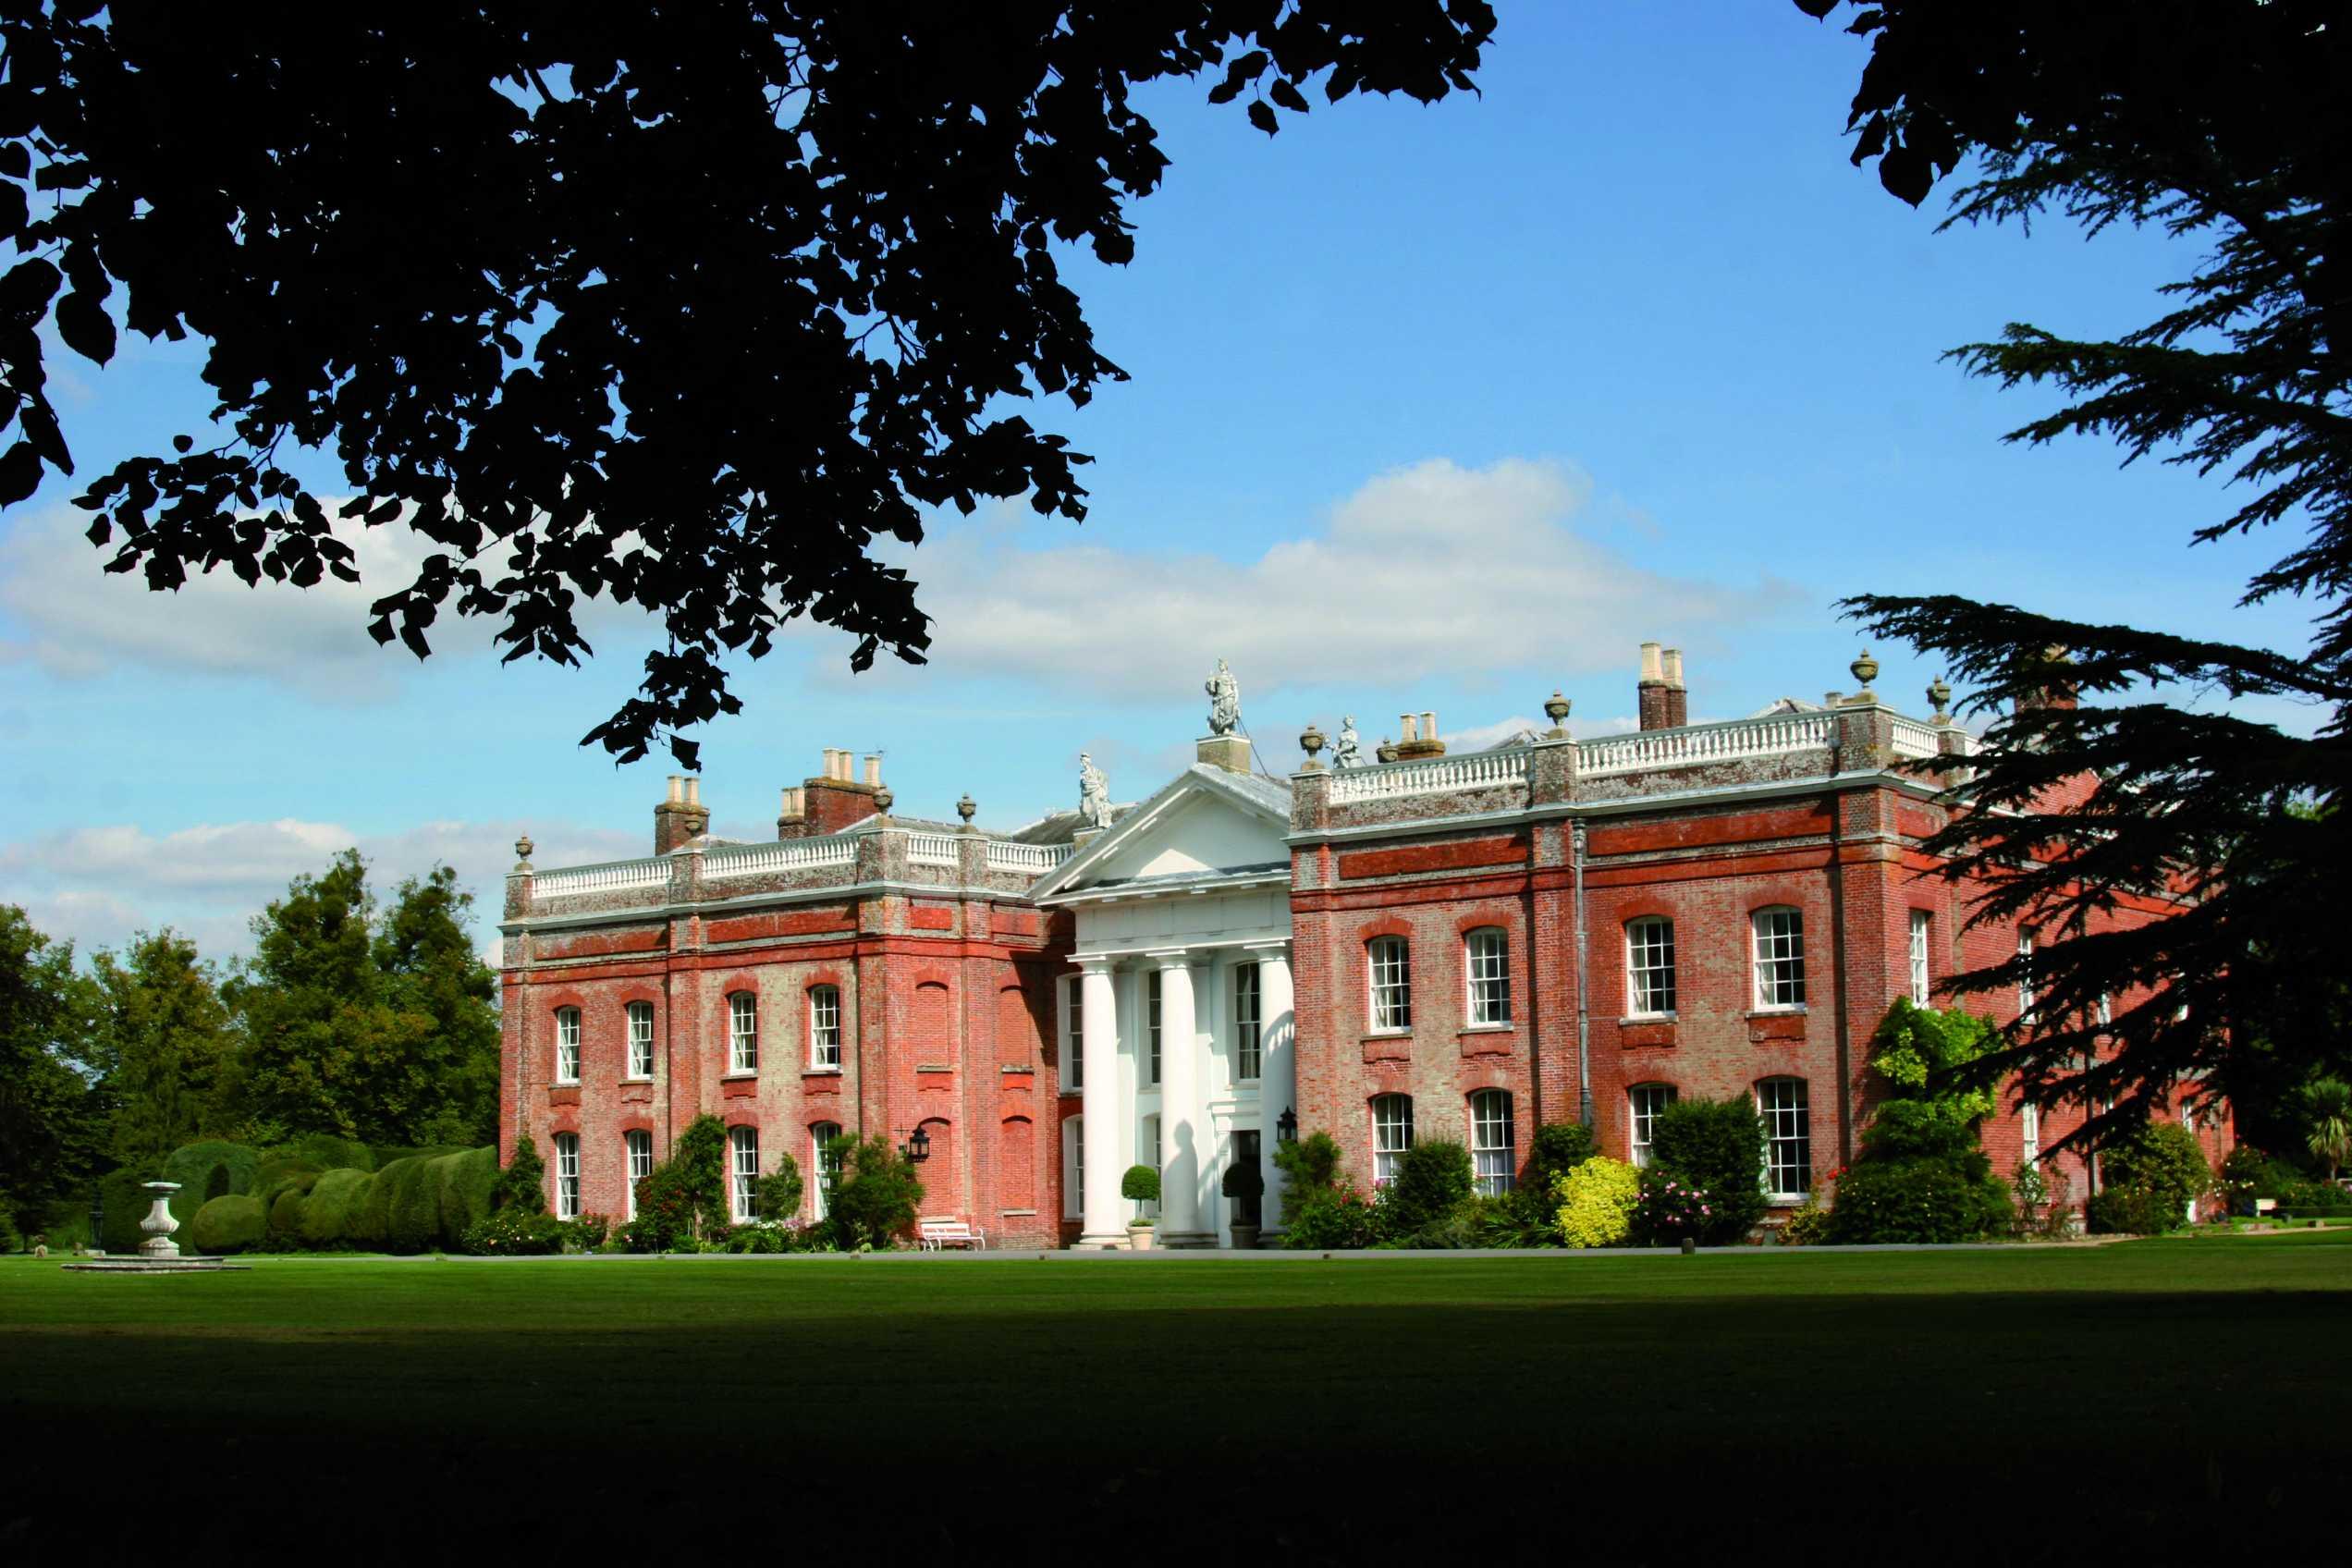 Avington Park, Hampshire, England